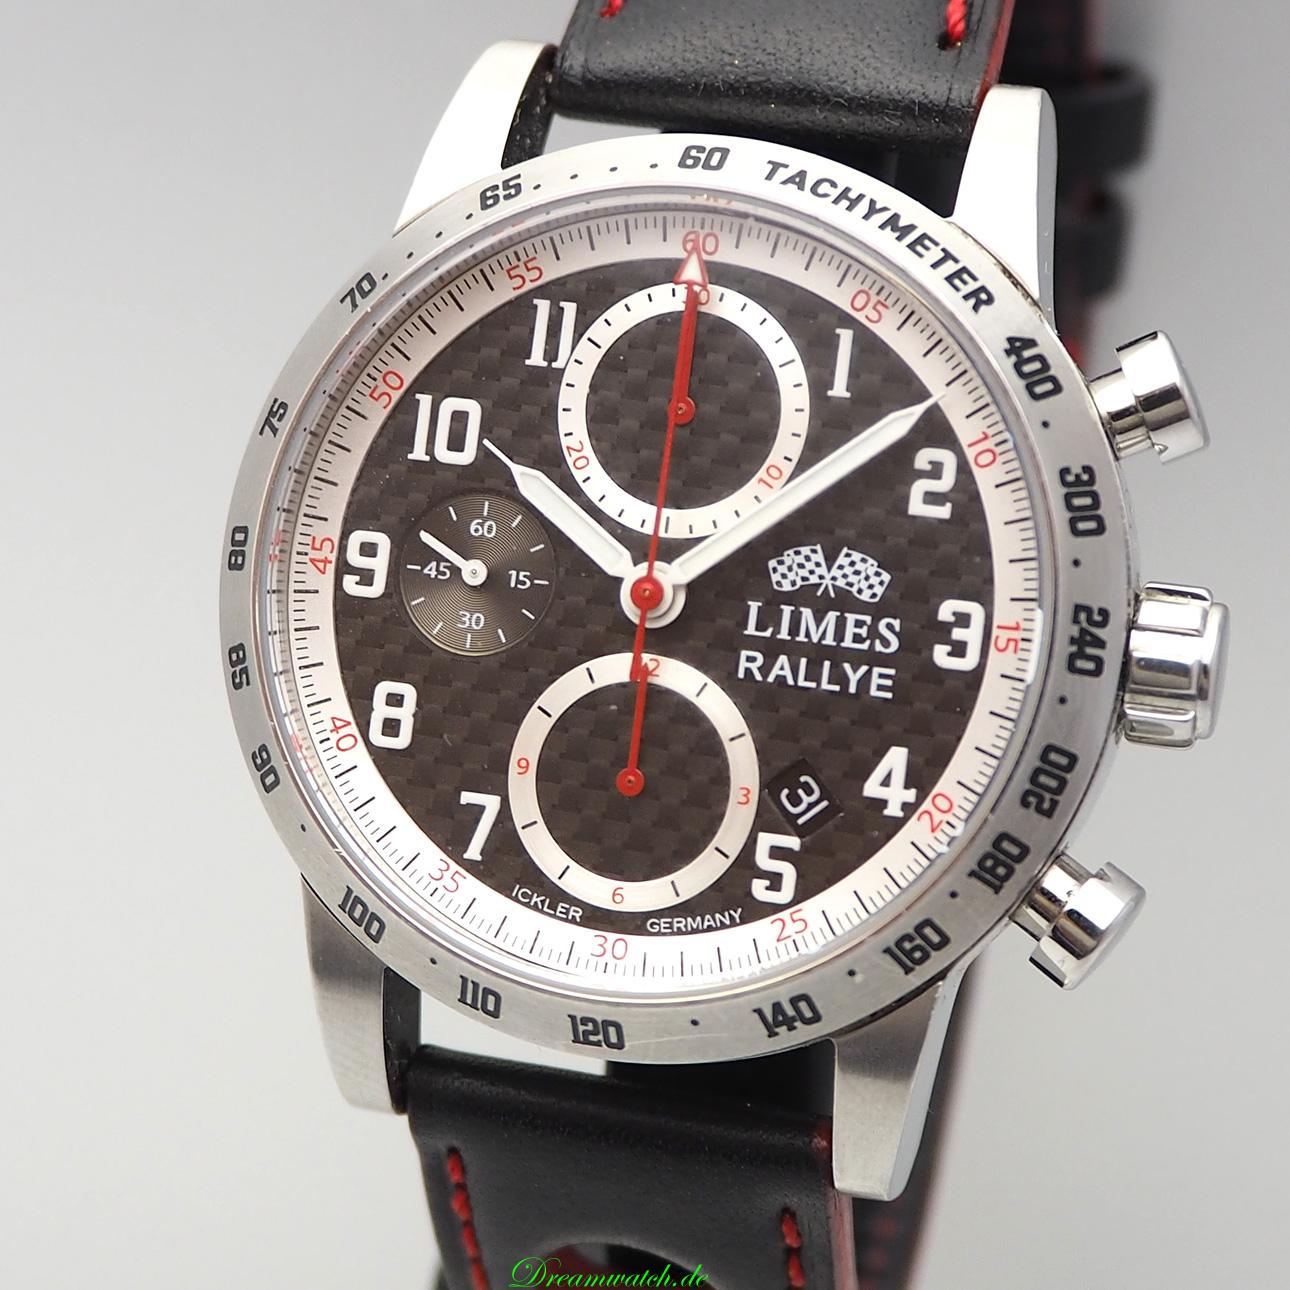 limes chronograph rallye limited edition 99 carbon ihr onlineshop f r gebrauchte luxusuhren. Black Bedroom Furniture Sets. Home Design Ideas